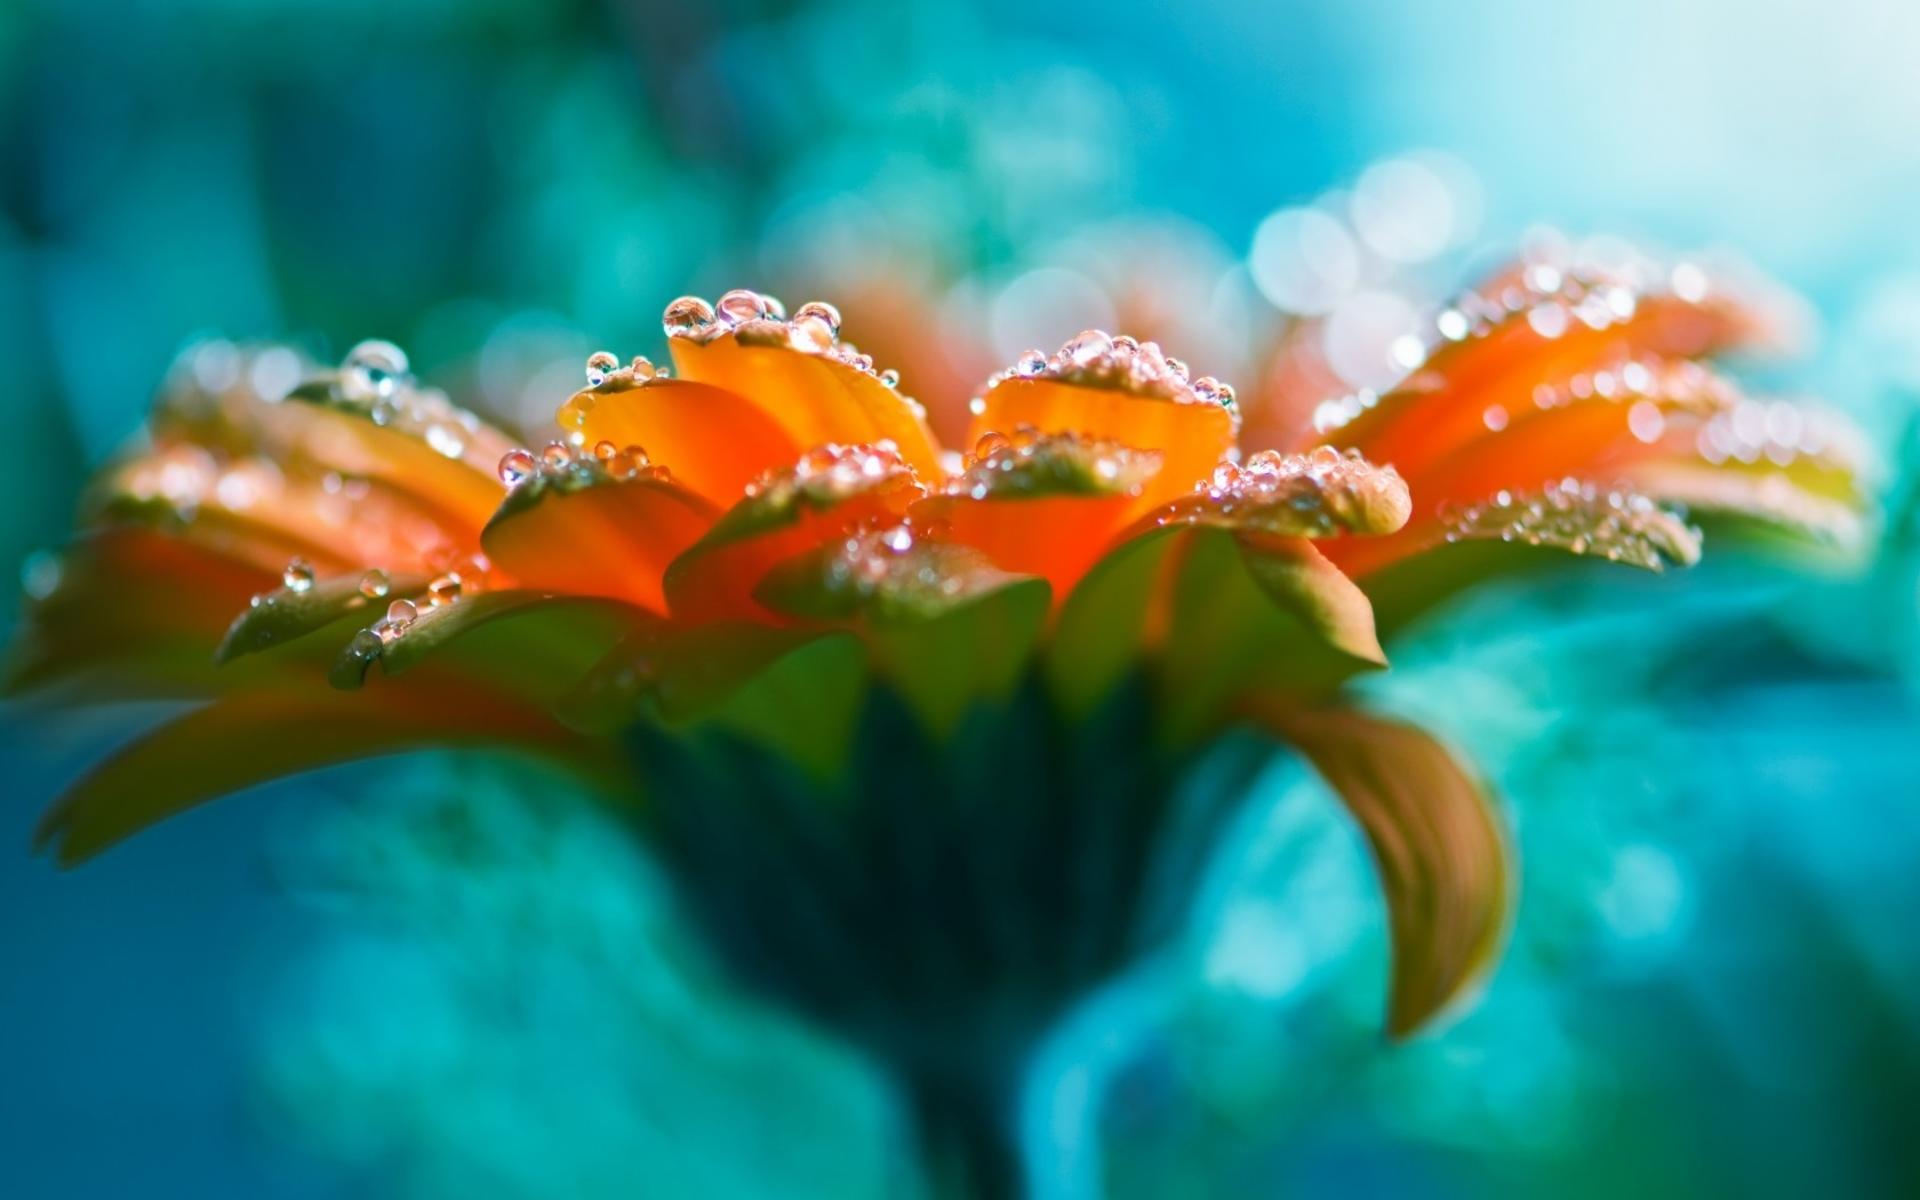 amazing flowers bright